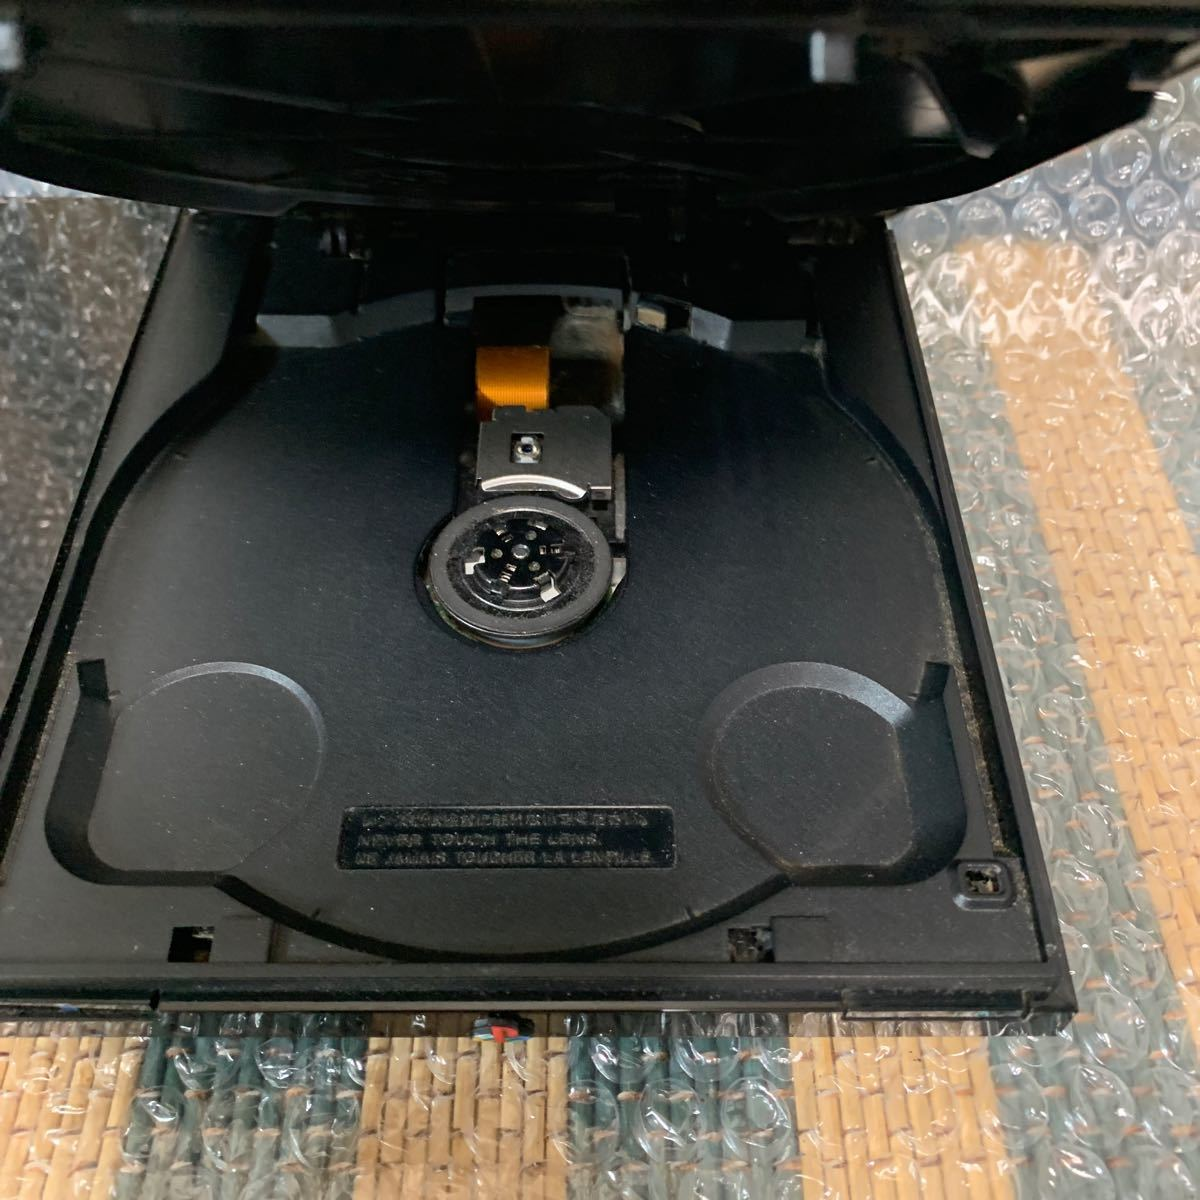 SONY ソニー  PS2本体セット 薄型 SCPH-90000 動作品 中古品 プレステ2 プレイステーション2 おまけ付き